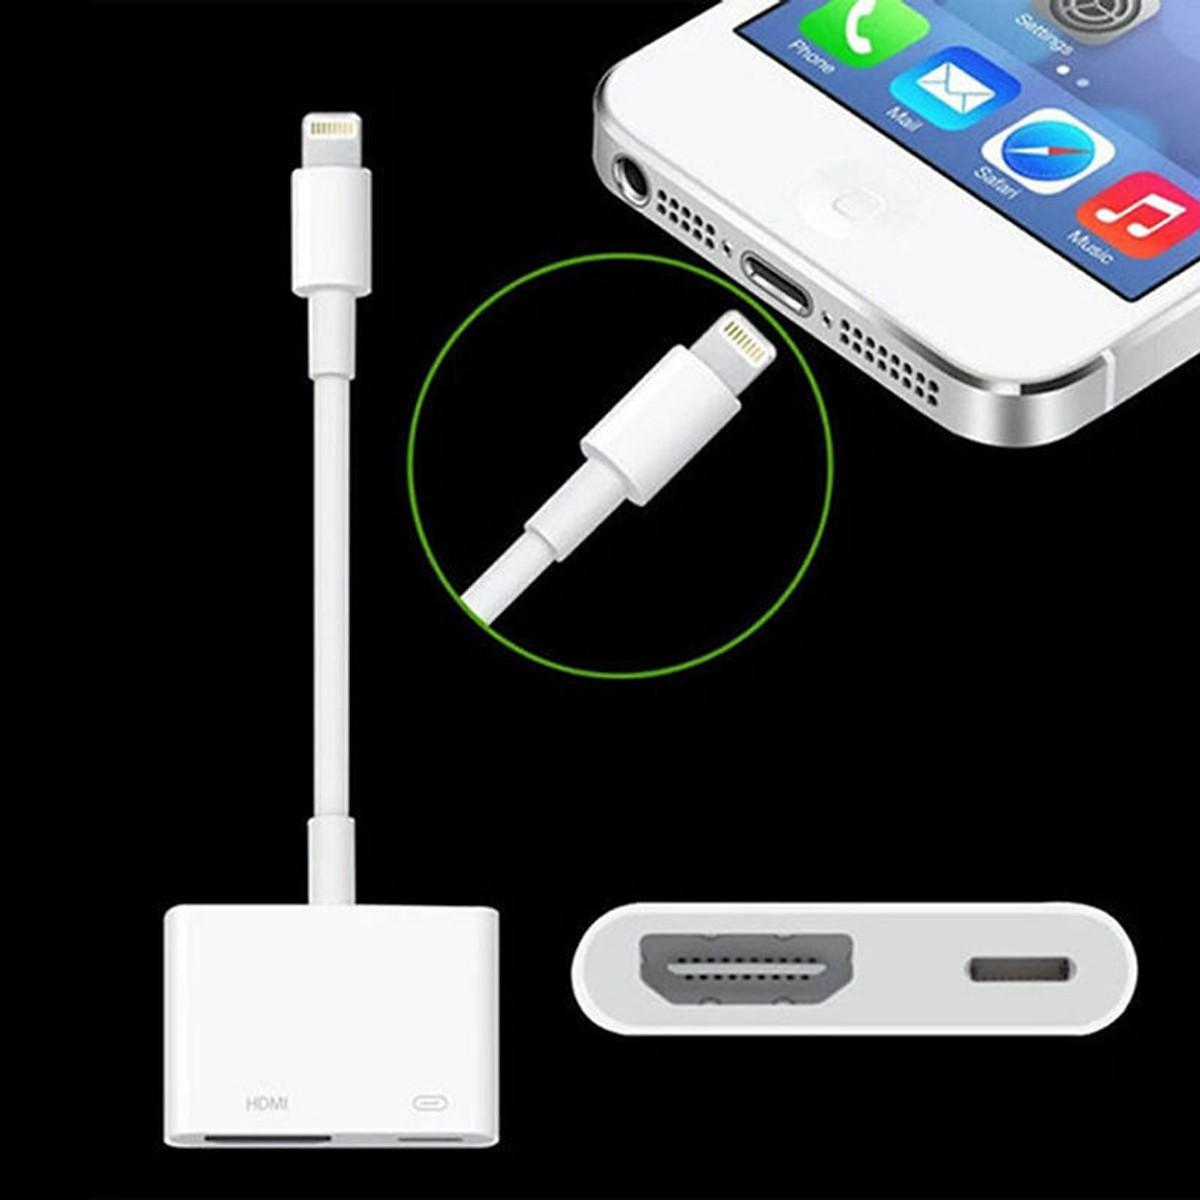 Cáp lightning to hdmi cho iPhone, iPad